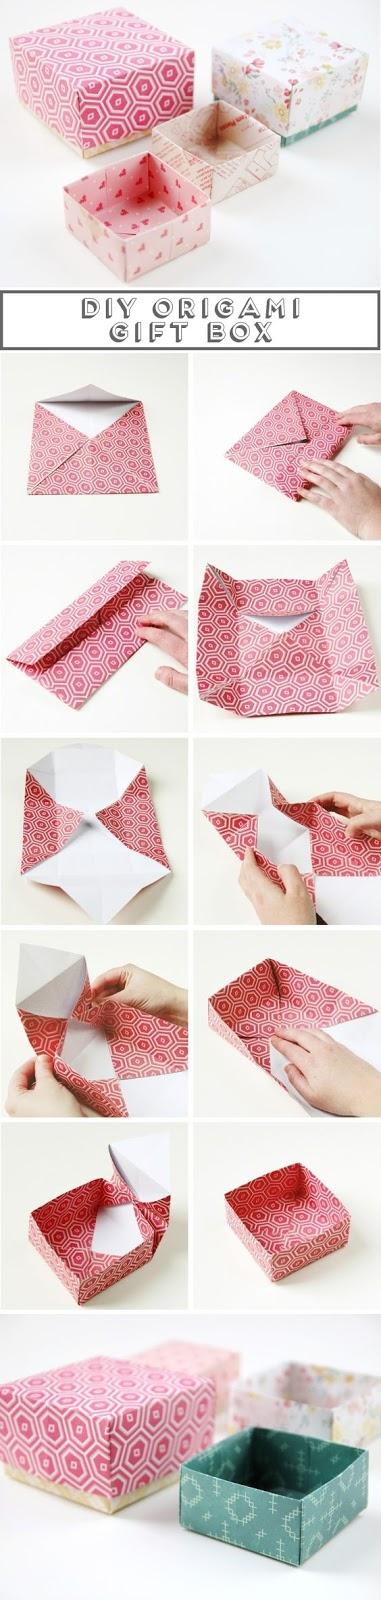 DIY Easy Origami Christmas Tree Tutorial Via JoeNakashima Step By Gift